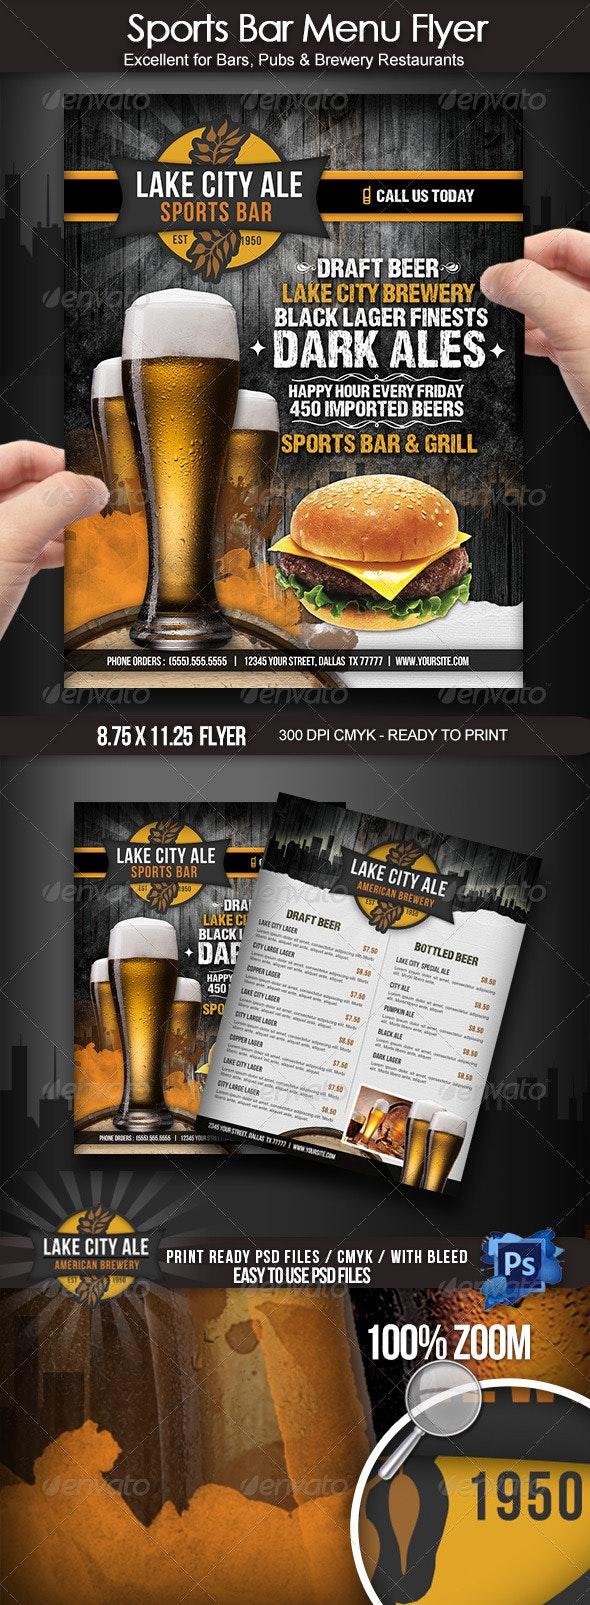 Sports Bar Menu Flyer - Restaurant Flyers